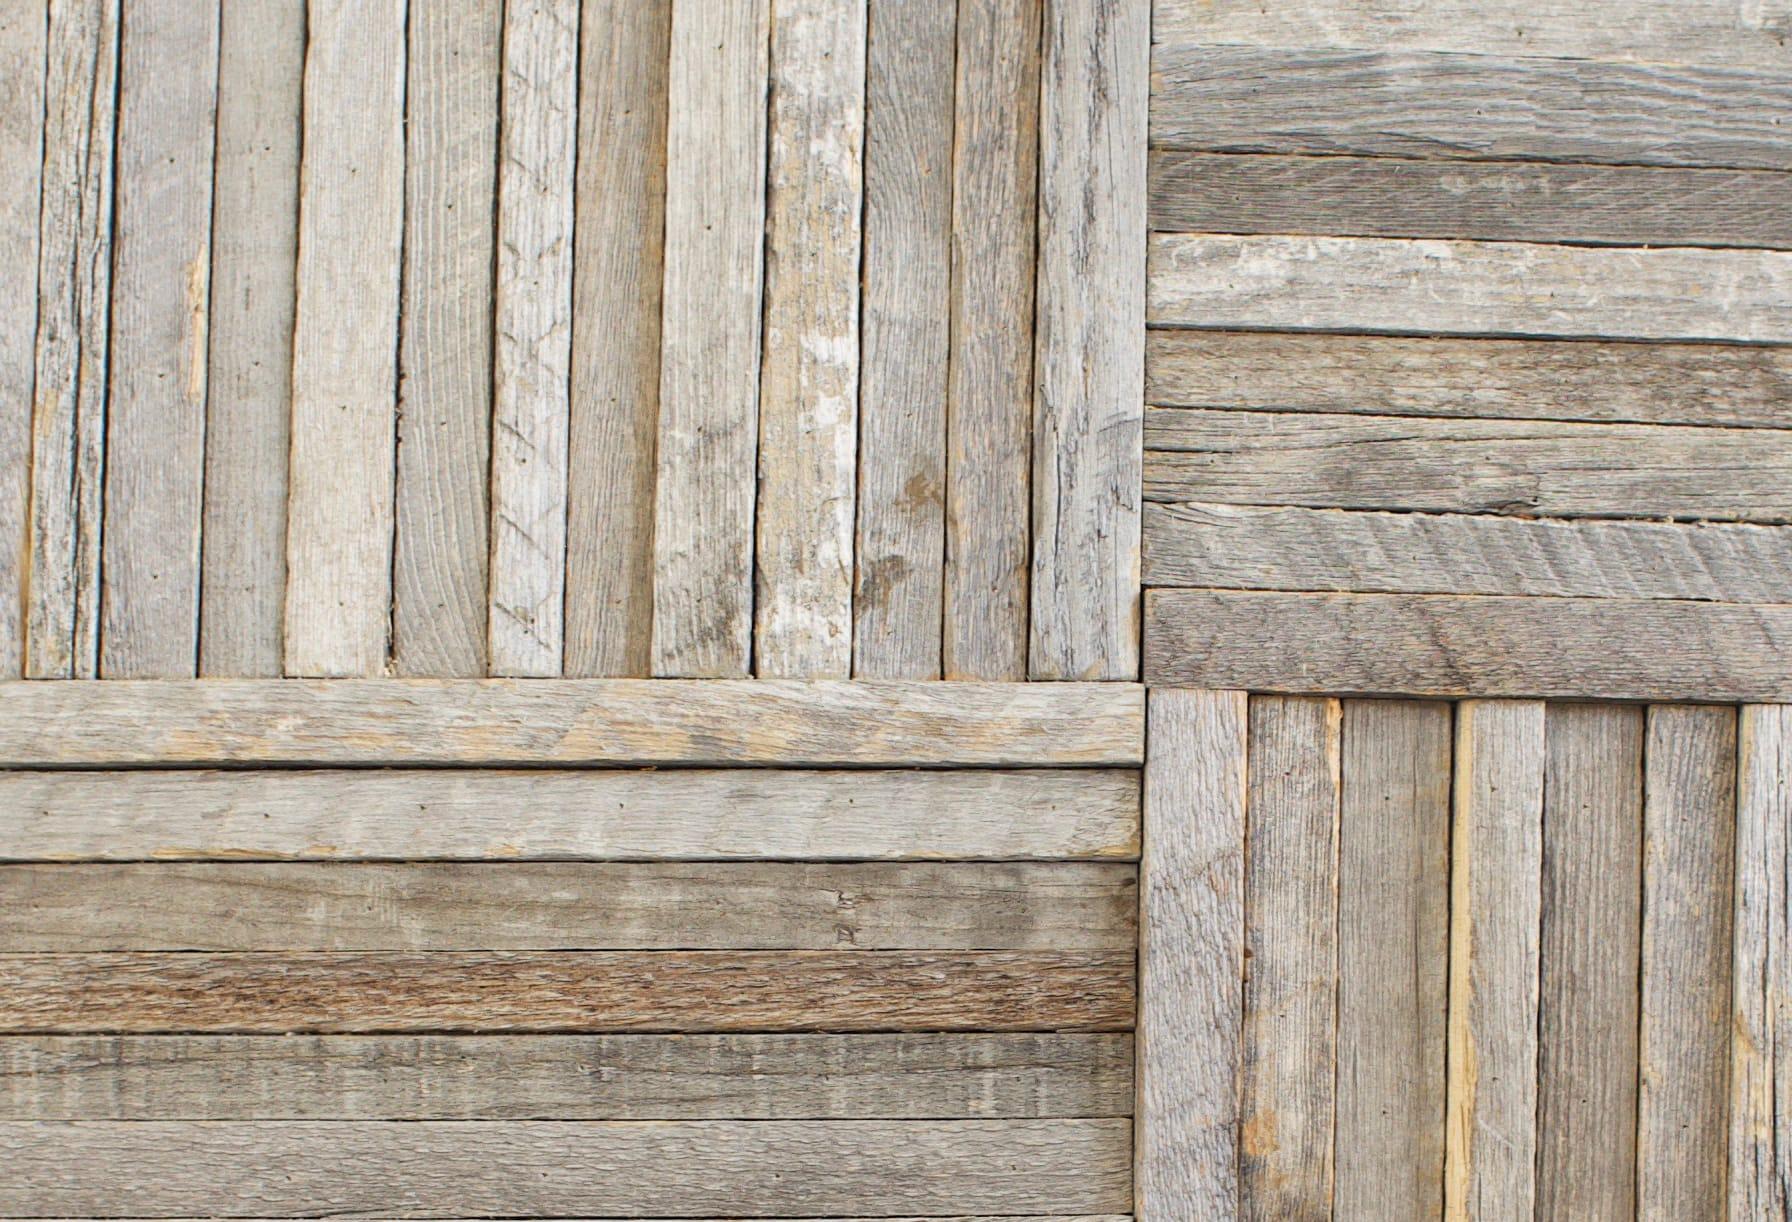 Closeup detail of Stikwood reclaimed wood wall art panels.